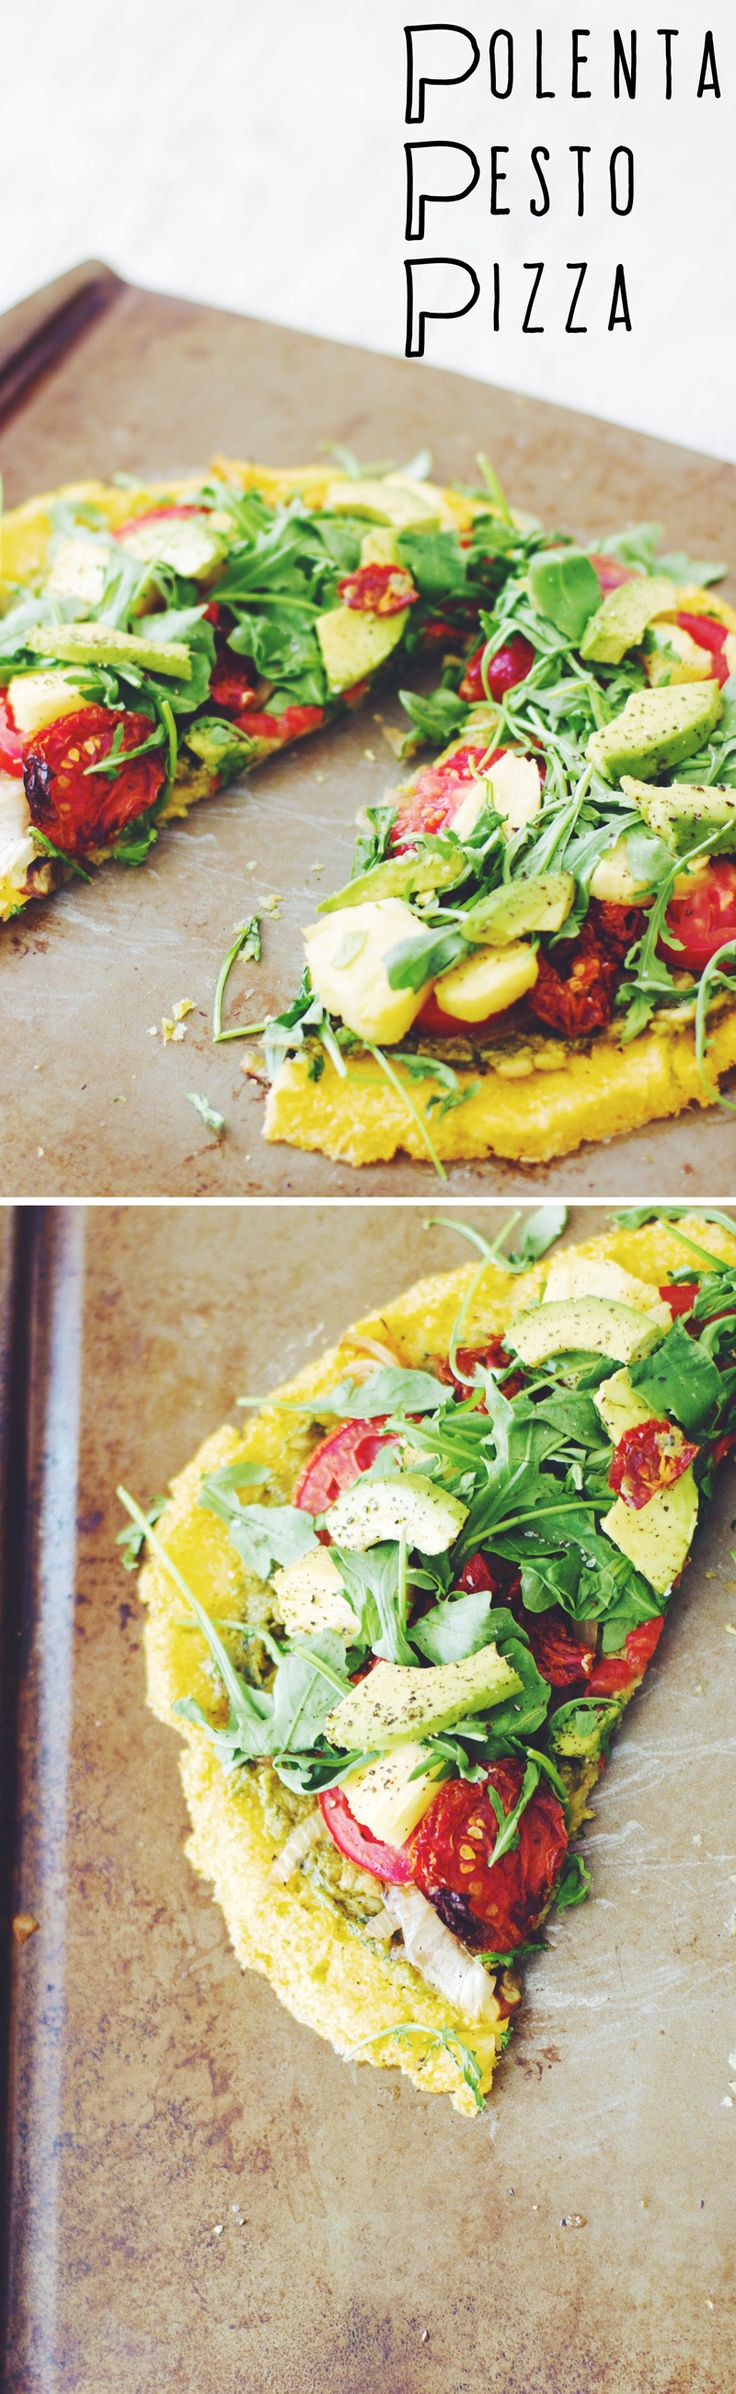 Polenta Pesto Pizza (vegan & gluten-free) ||| Brewing Happiness